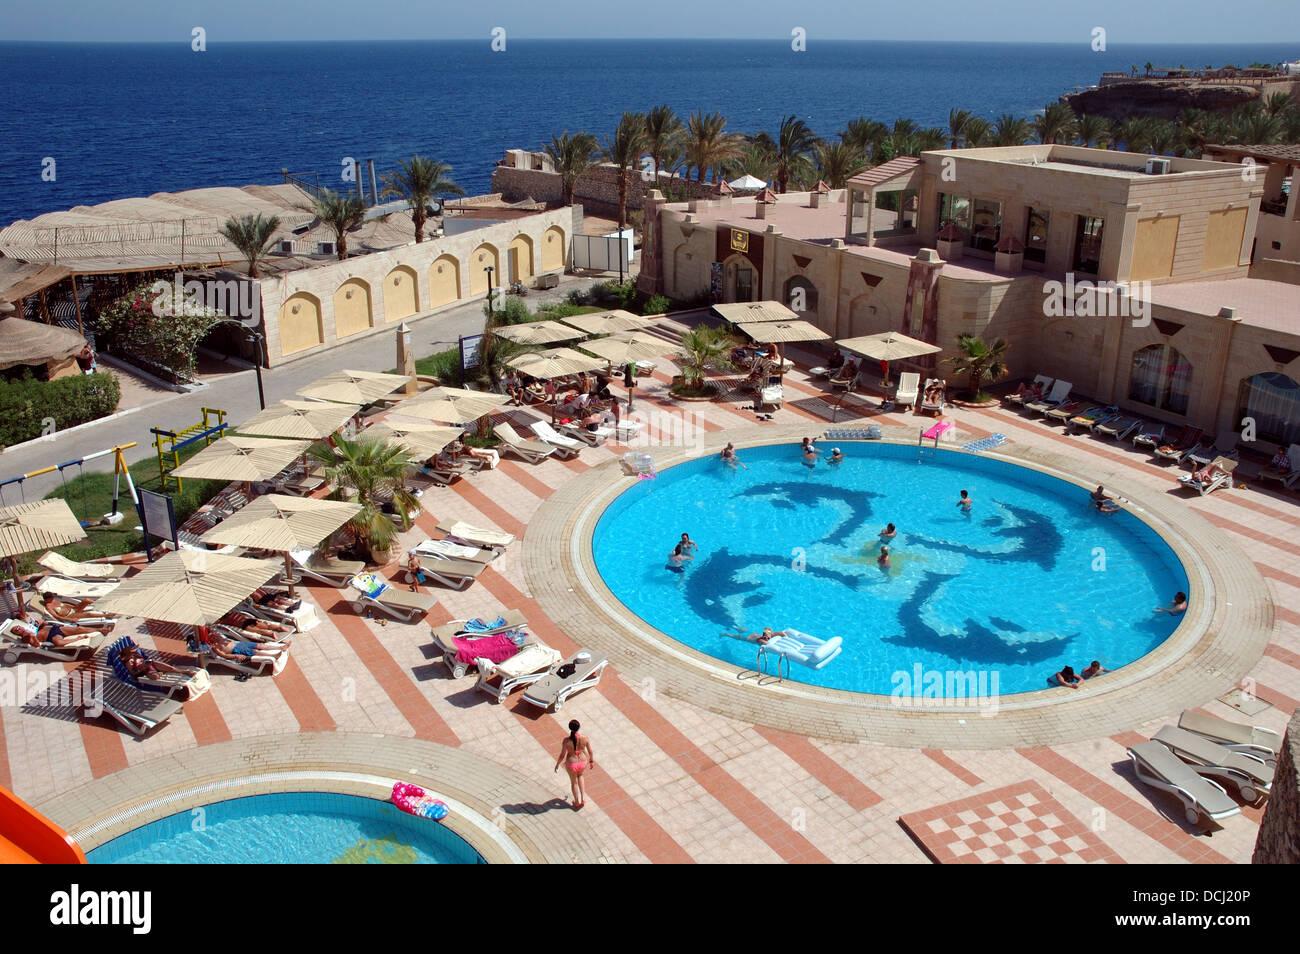 Dreams Beach Resort, Um El Sid, Sharm El Sheikh, Egypt. - Stock Image